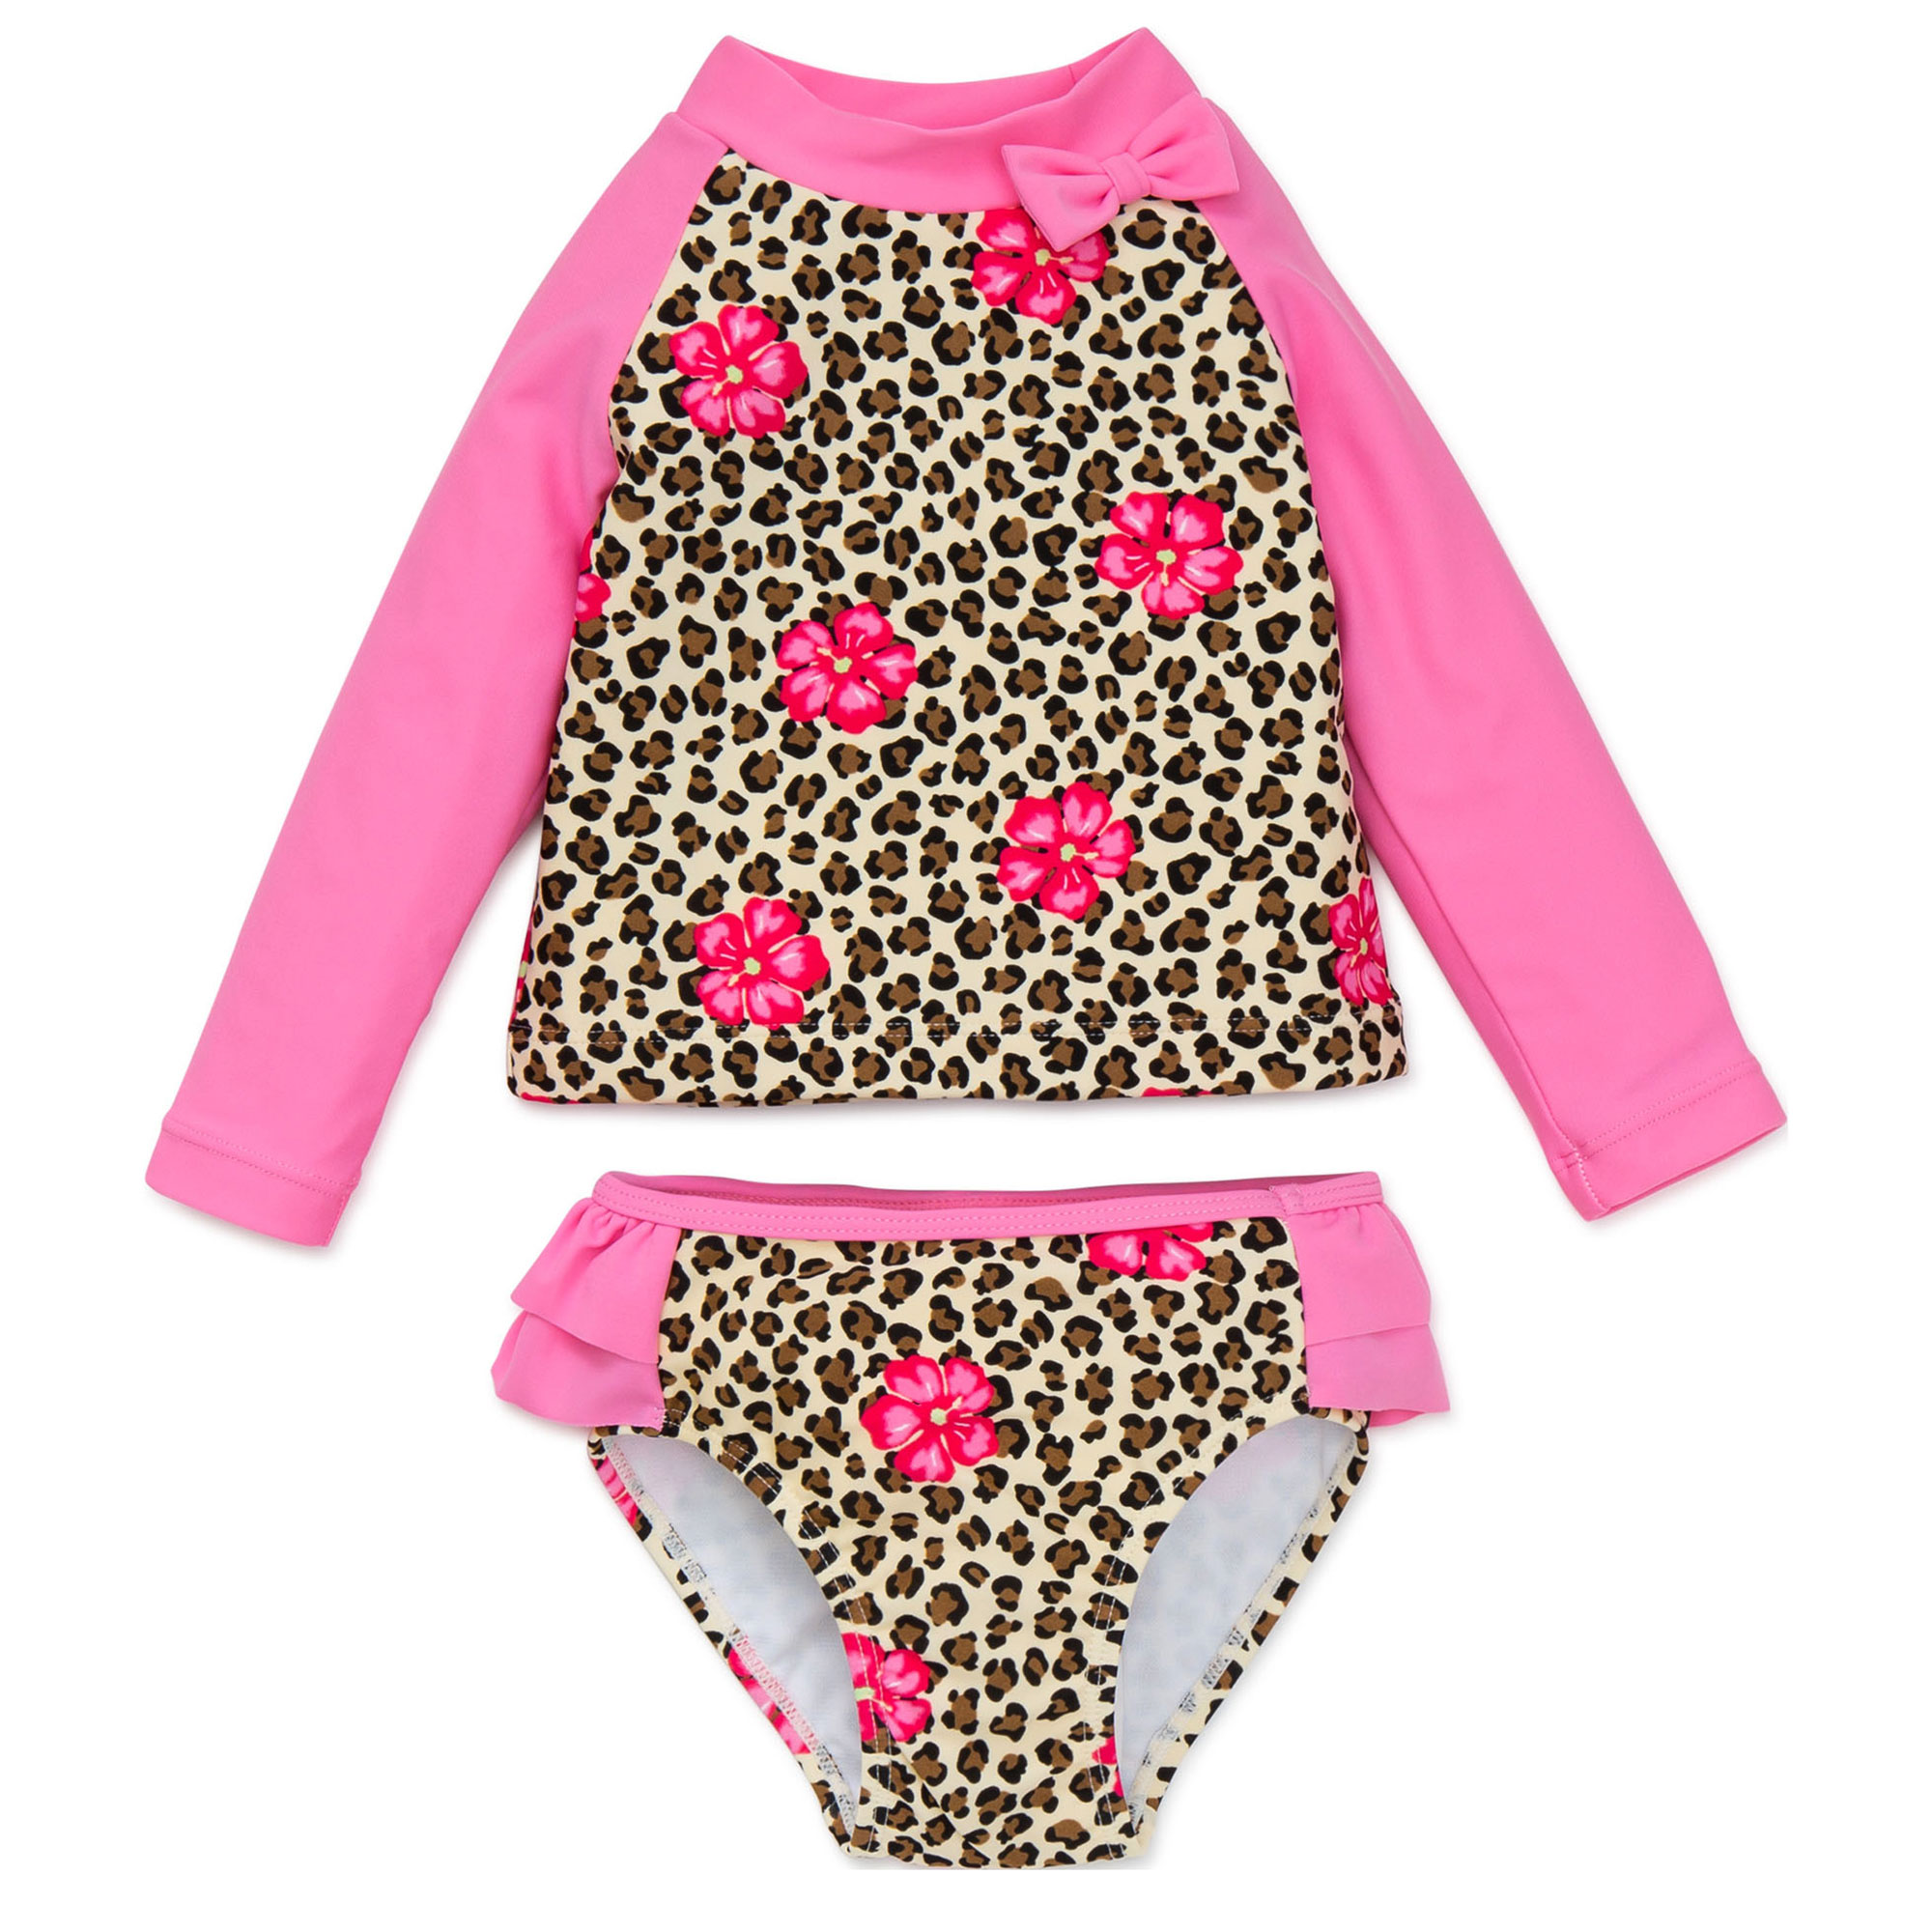 Toddler Girl Leopard Print Long Sleeve 2pc Rashguard Multi 2T by